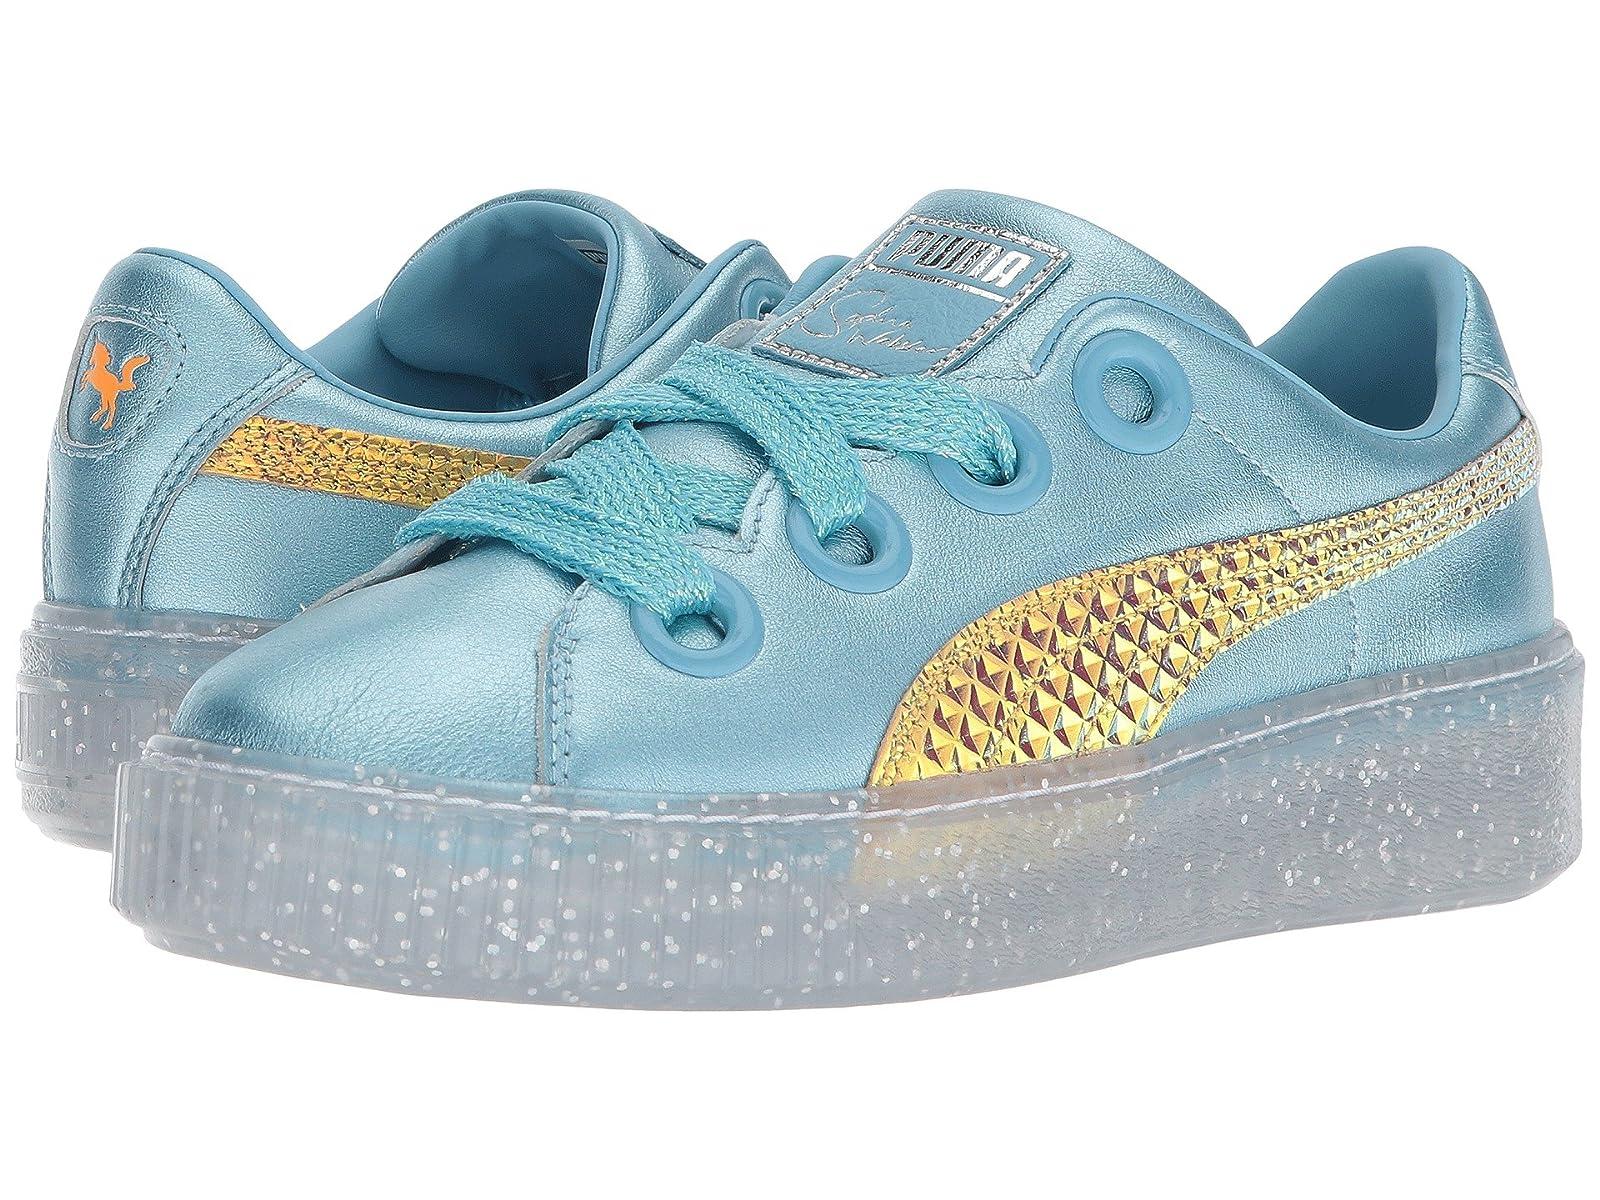 PUMA PUMA x Sophia Webster Platform Glitter PrincessCheap and distinctive eye-catching shoes